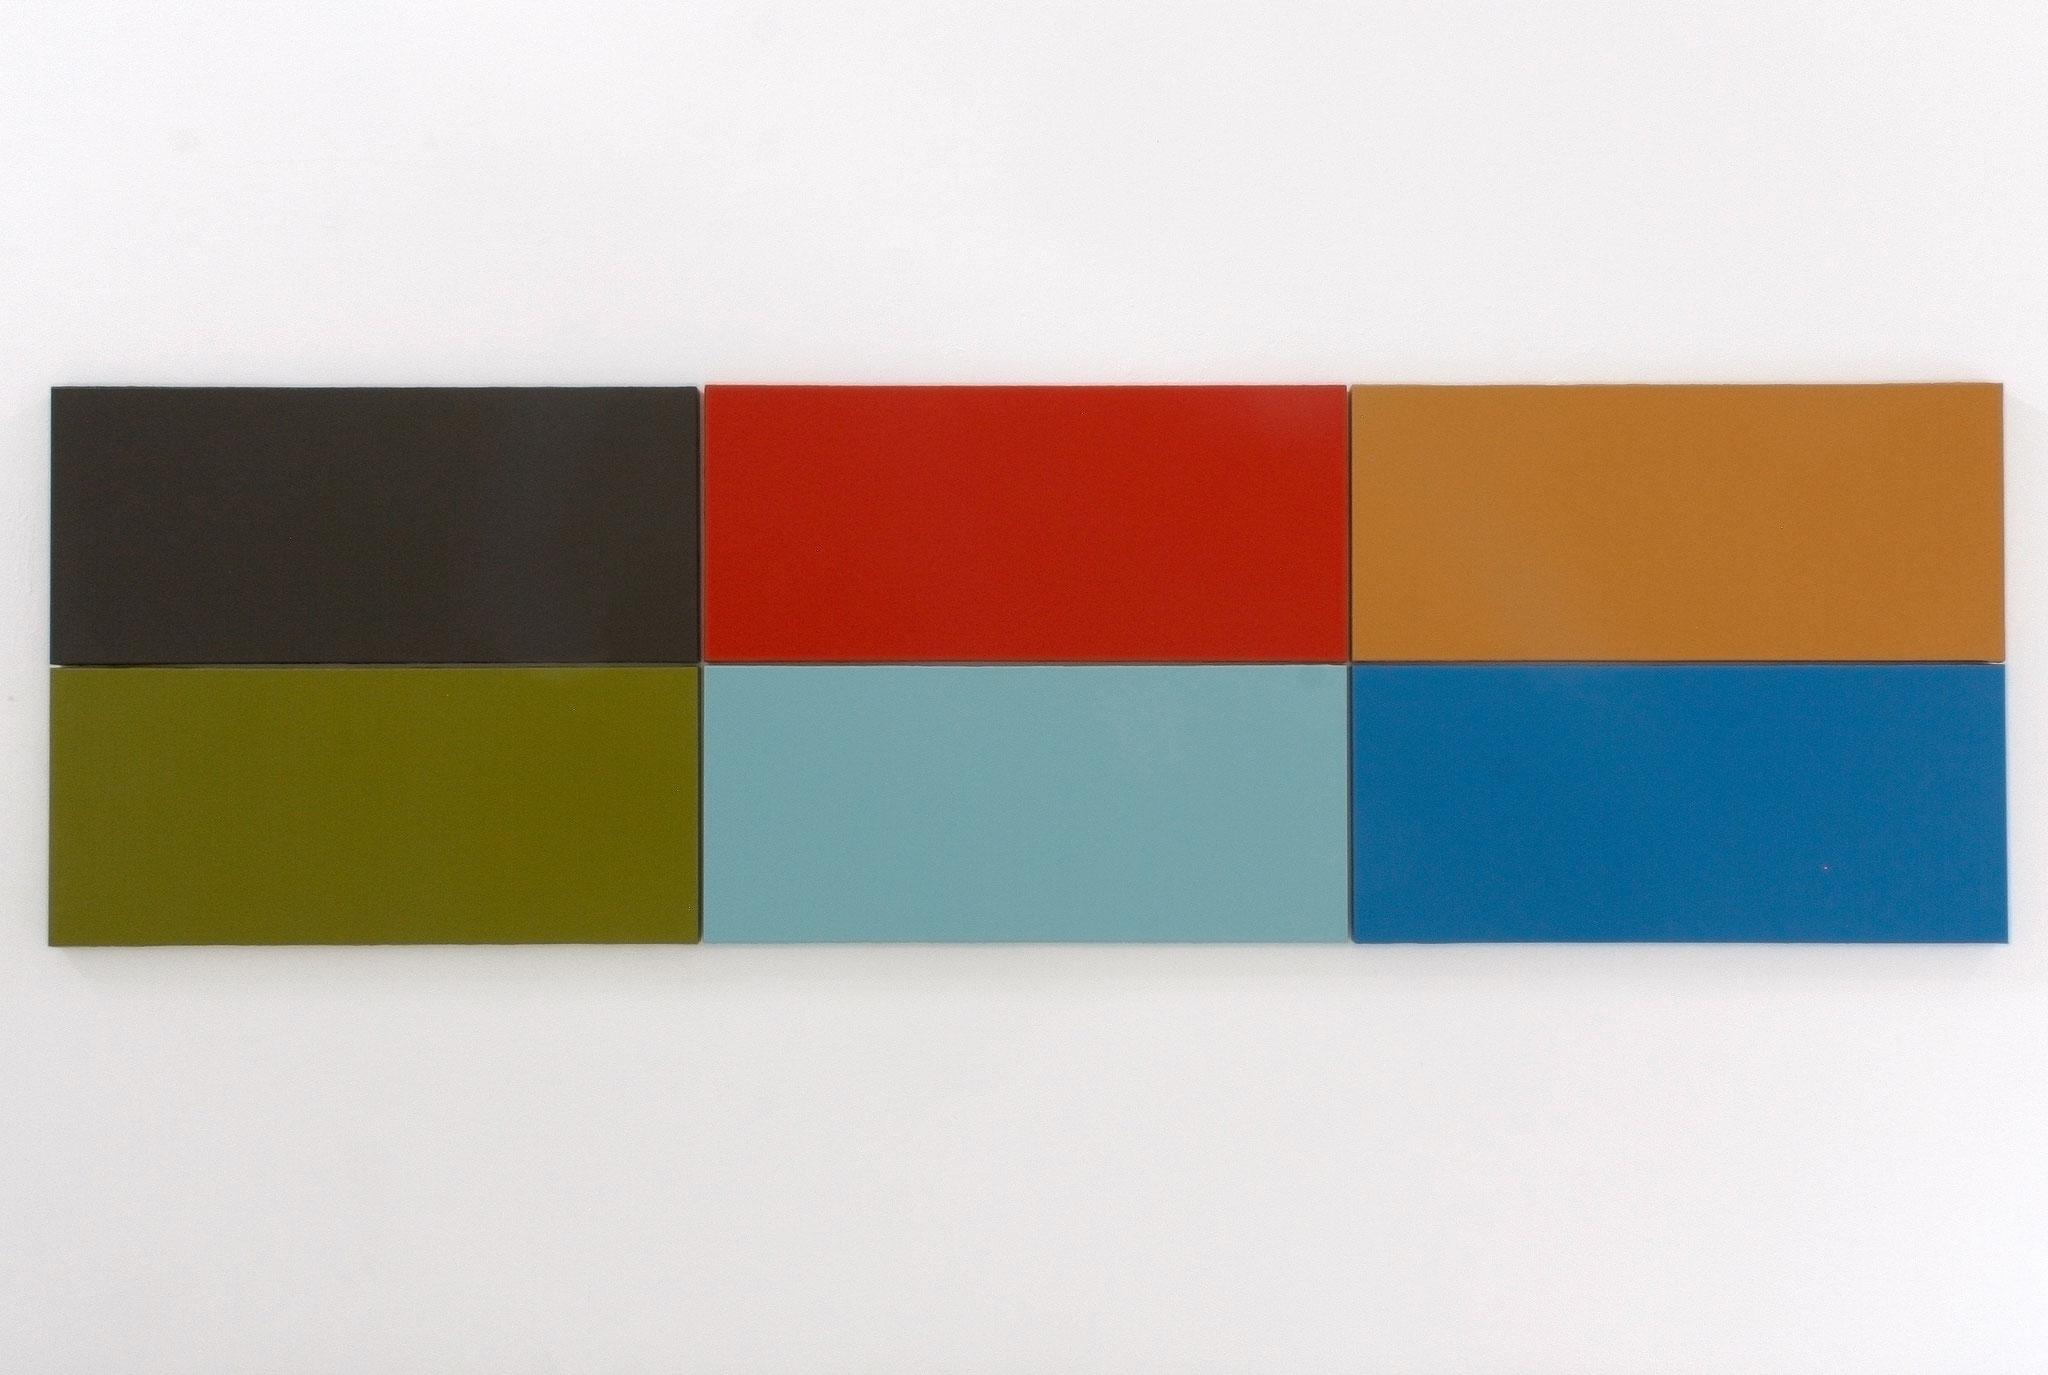 Daniel Schörnig  FILM COLORS II  2015-2021  |  acrylic on canvas in six parts  125 x 425 cm